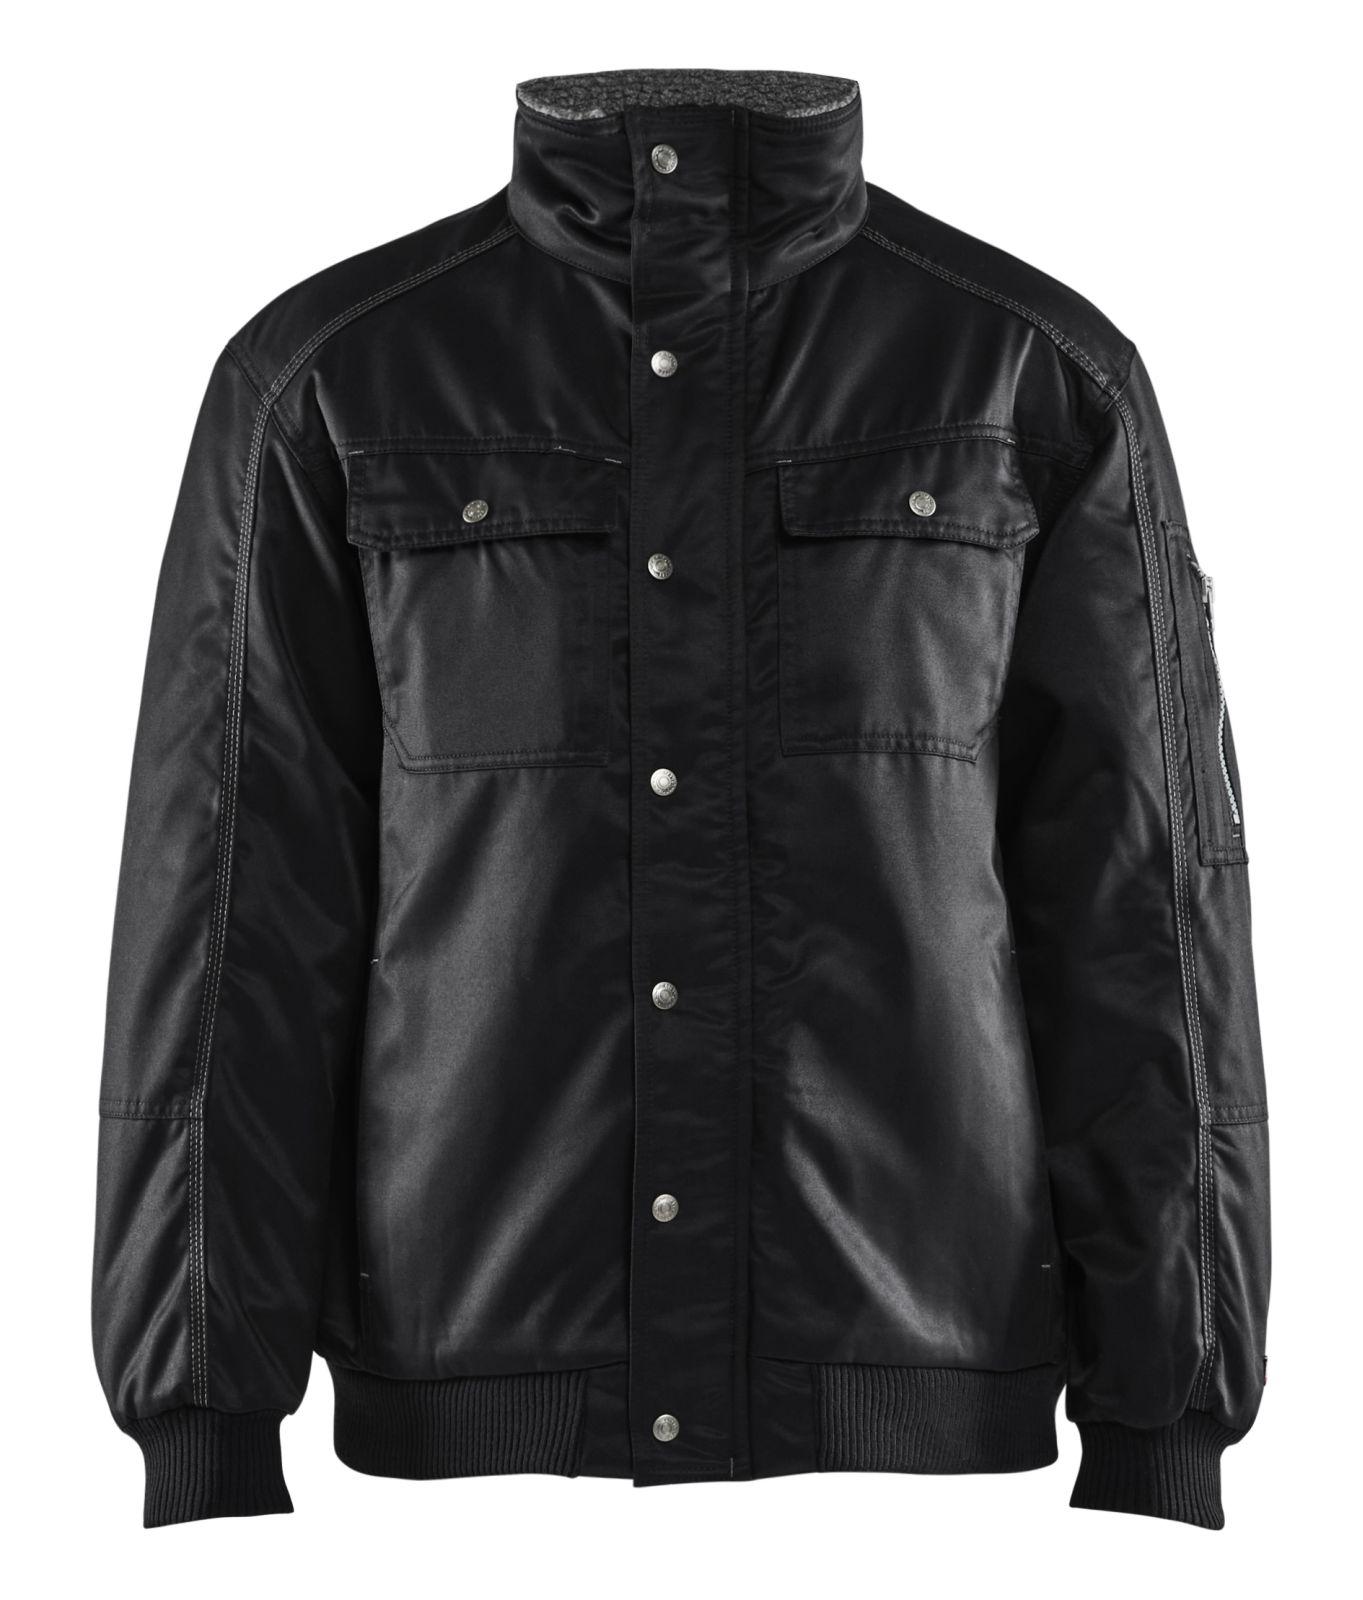 Blaklader Pilot jacks 49161900 zwart(9900)